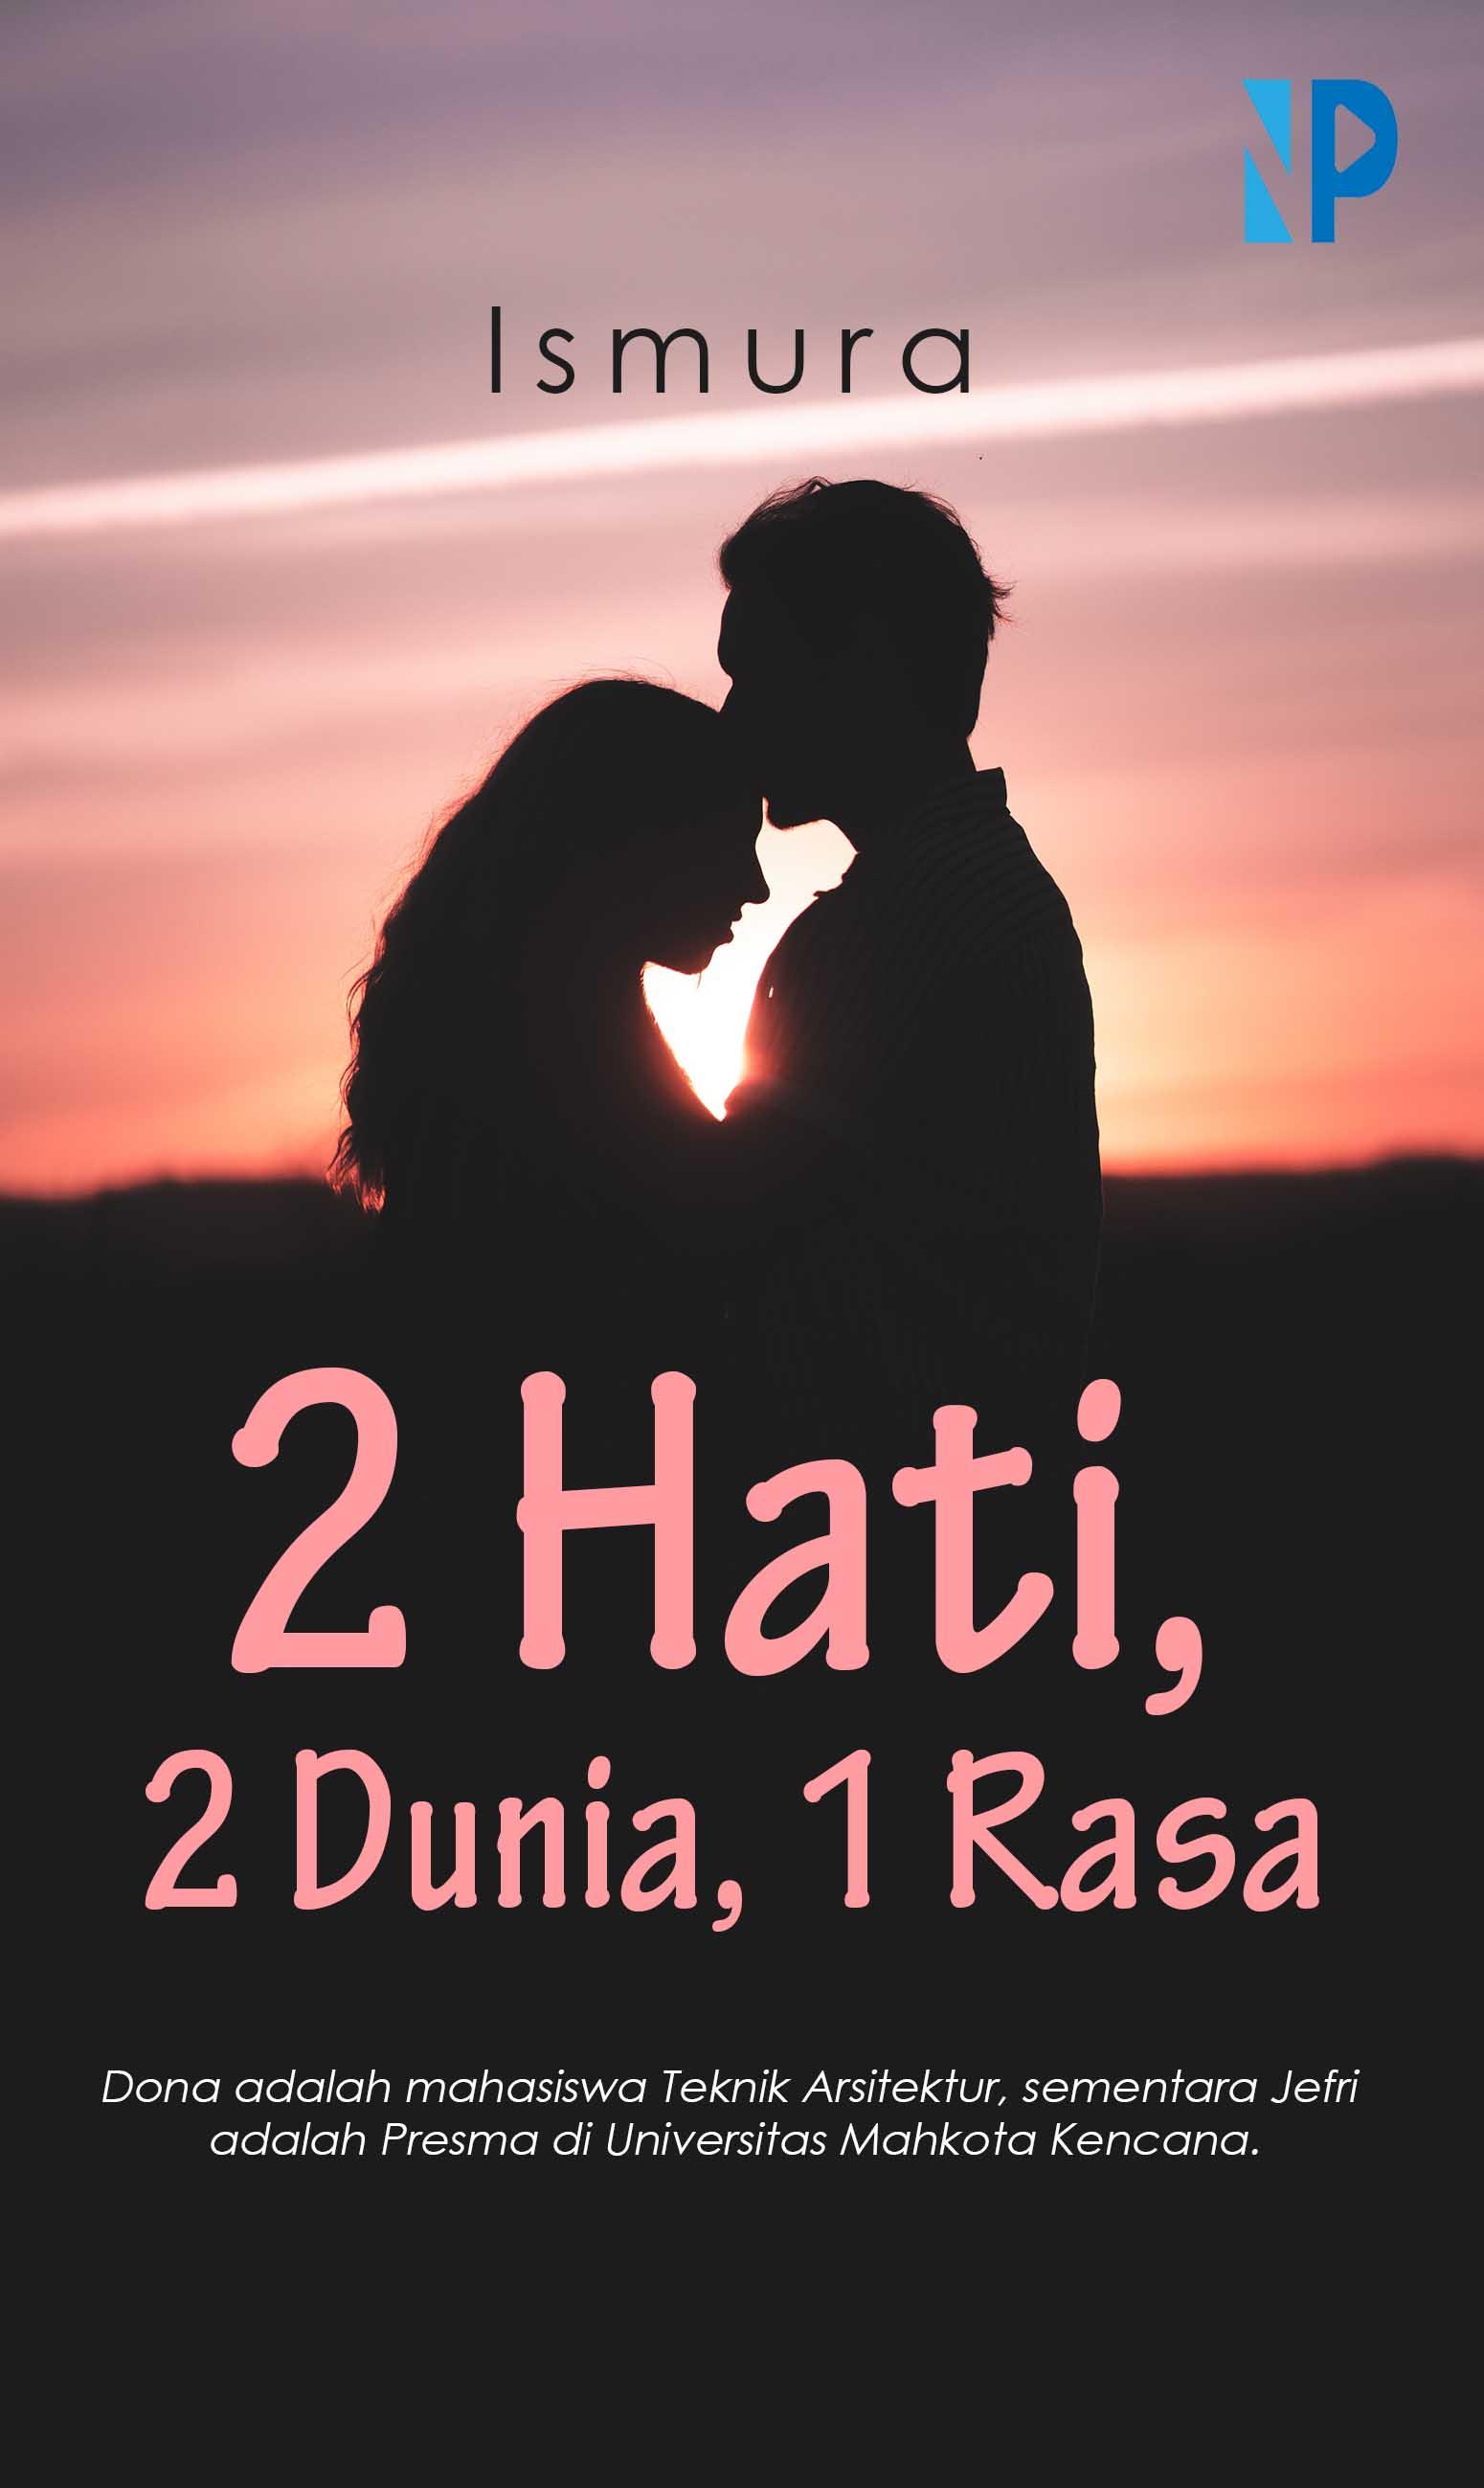 2 hati, 2 dunia, 1 rasa [sumber elektronis]